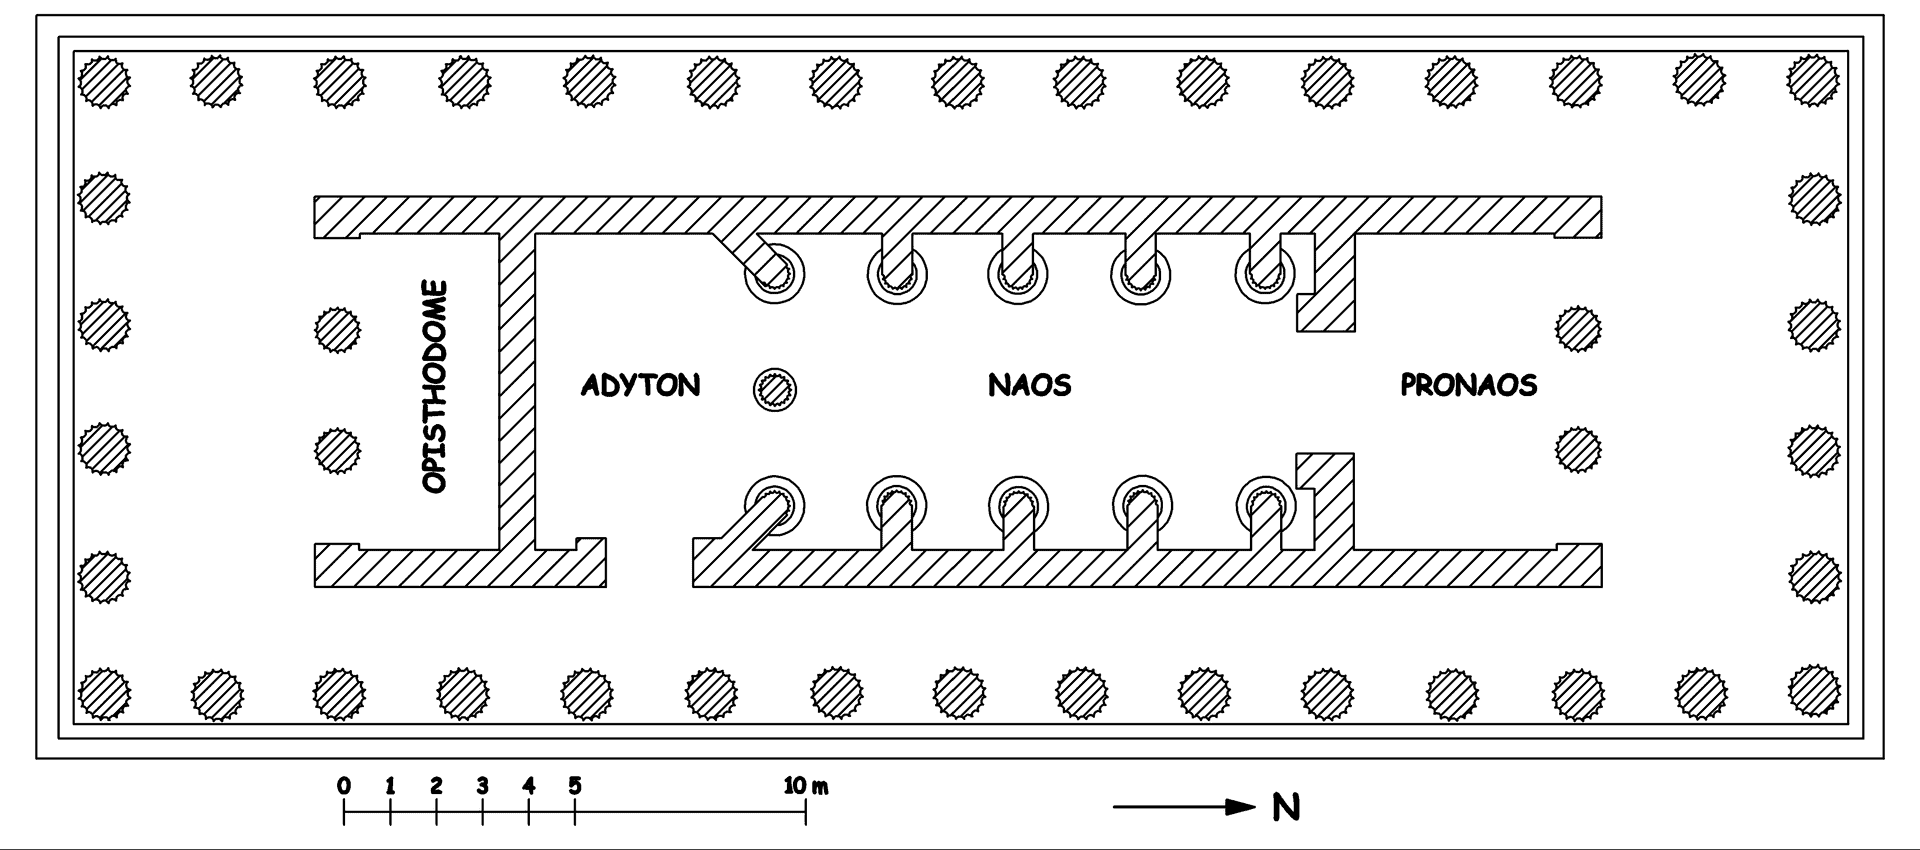 Ejemplo de ádyton del templo de Apolo de Figalia.